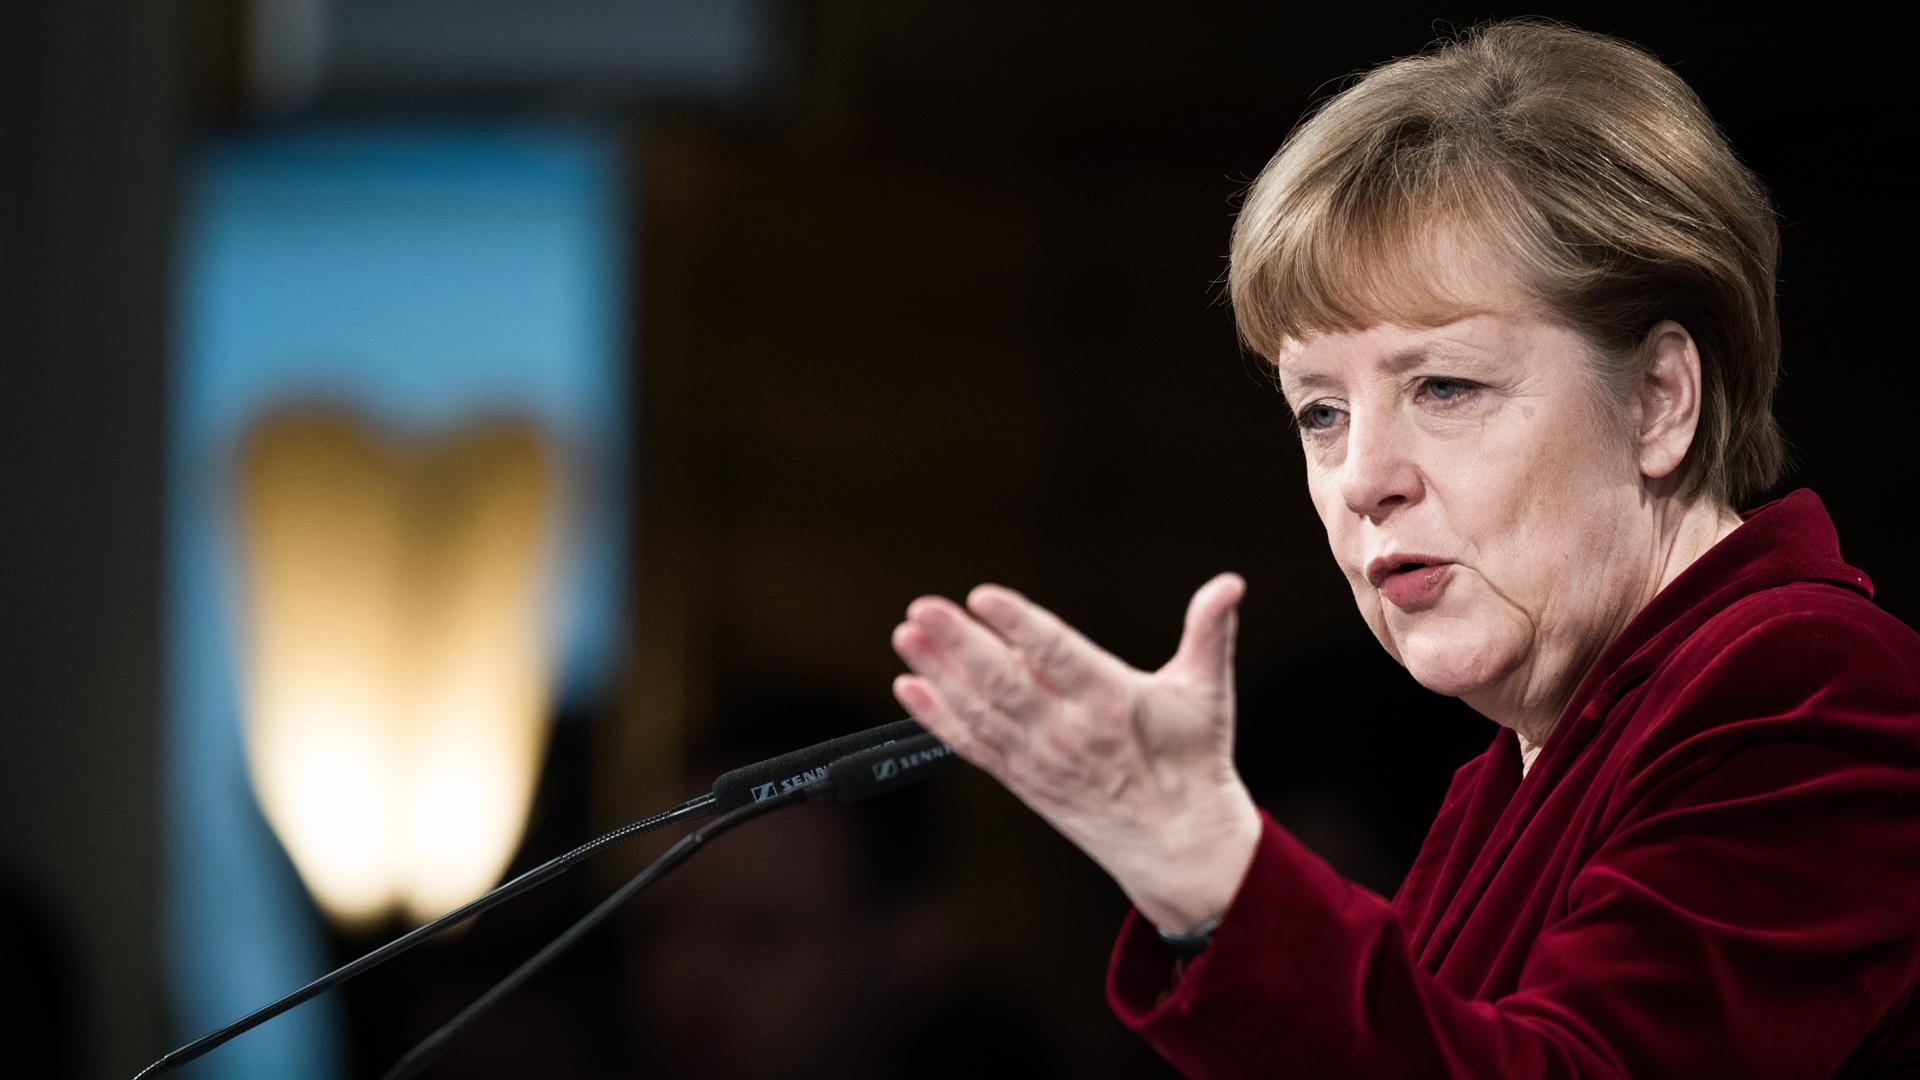 Angela Merkel Wallpapers Wallpaper Cave